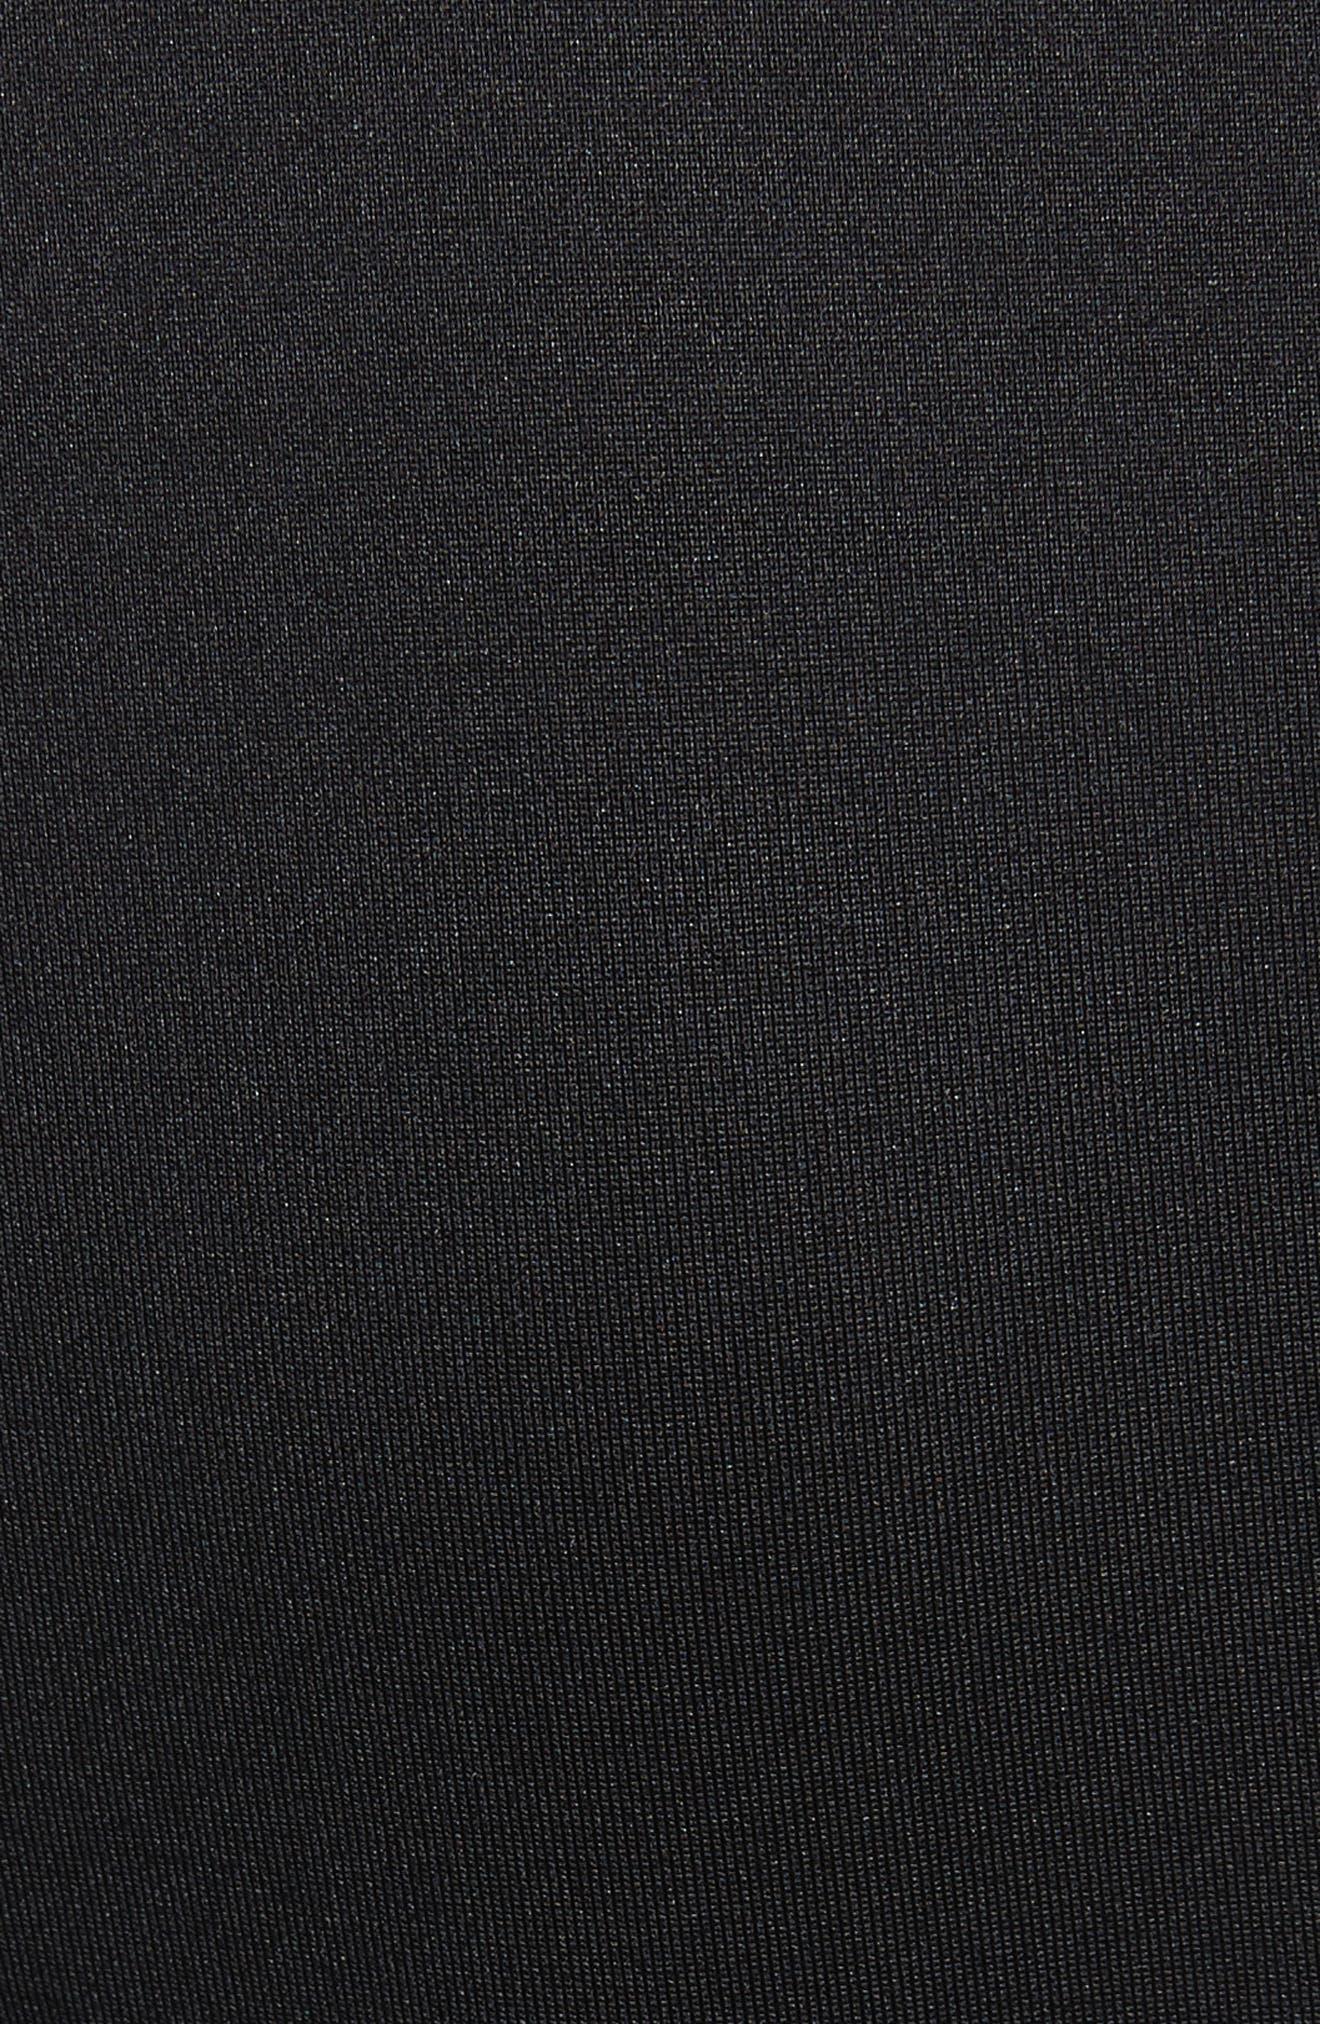 Salnie Cold Shoulder Sheath Dress,                             Alternate thumbnail 5, color,                             001